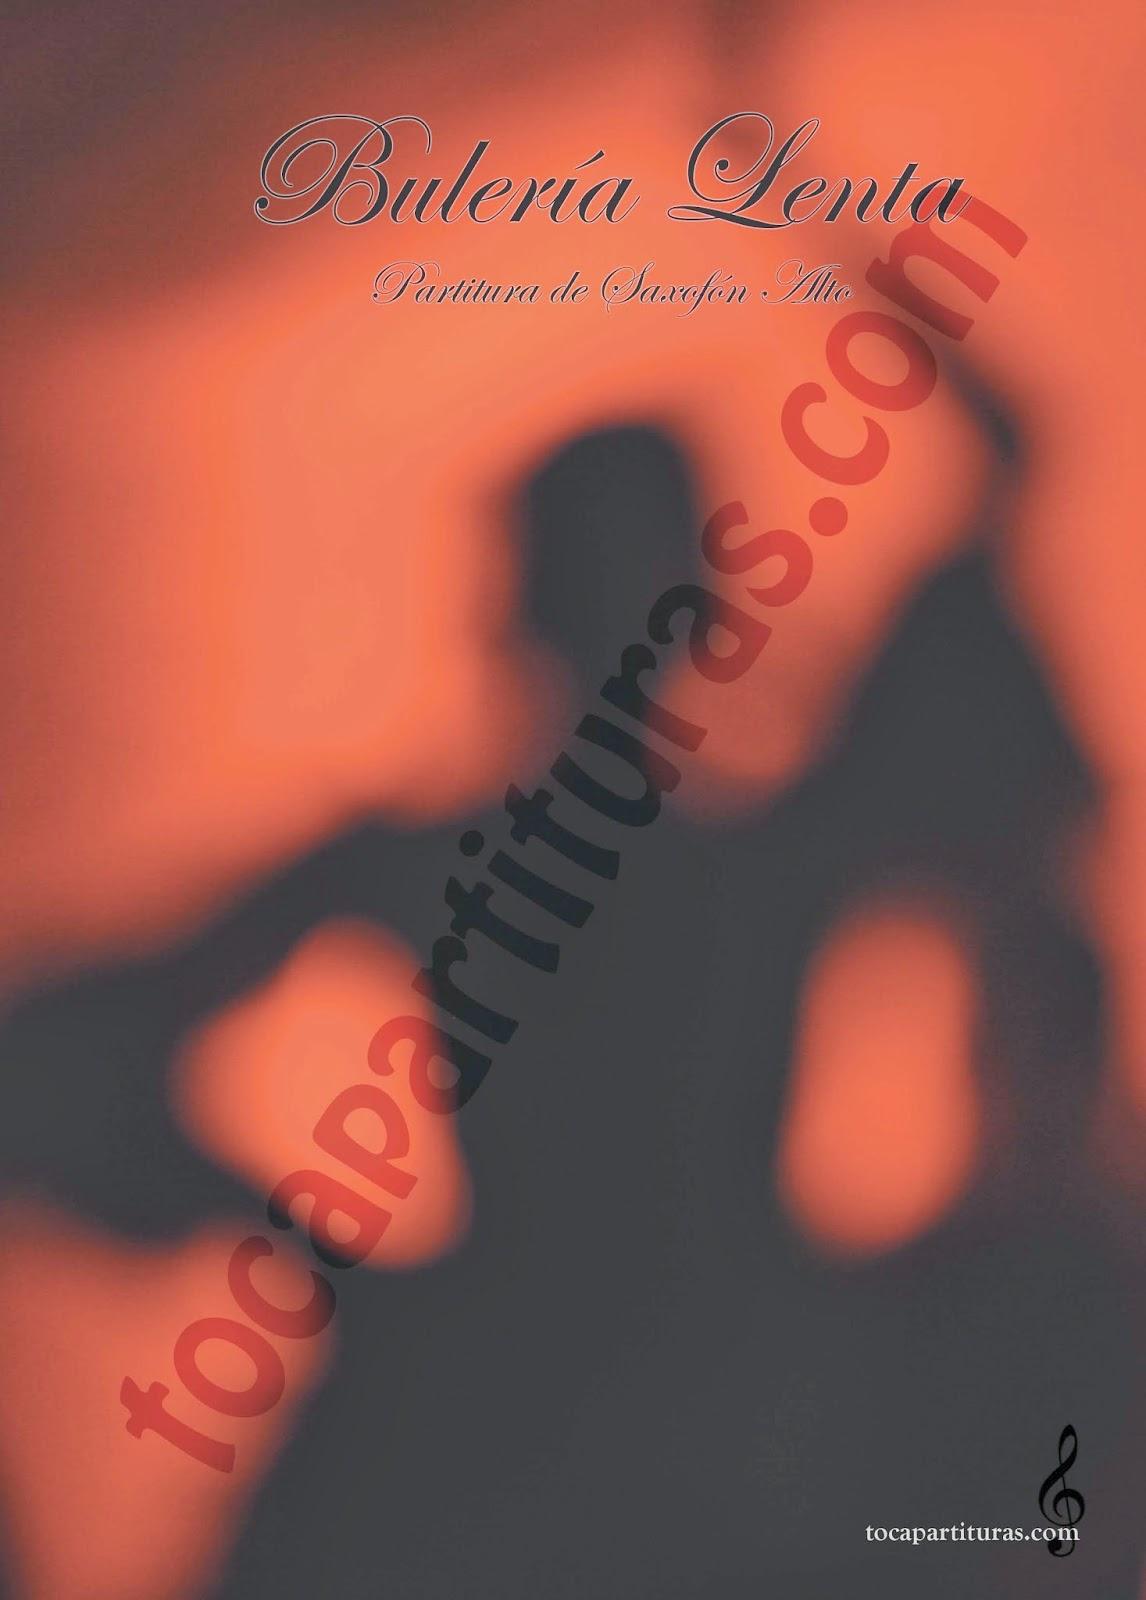 Bulería Lenta por diegosax Partitura de Flauta, Violín, Saxofón Alto, Trompeta, Viola, Oboe, Clarinete, Saxo Tenor, Soprano Sax, Trombón, Fliscorno, chelo, Fagot, Barítono, Bombardino, Trompa o corno, Tuba...